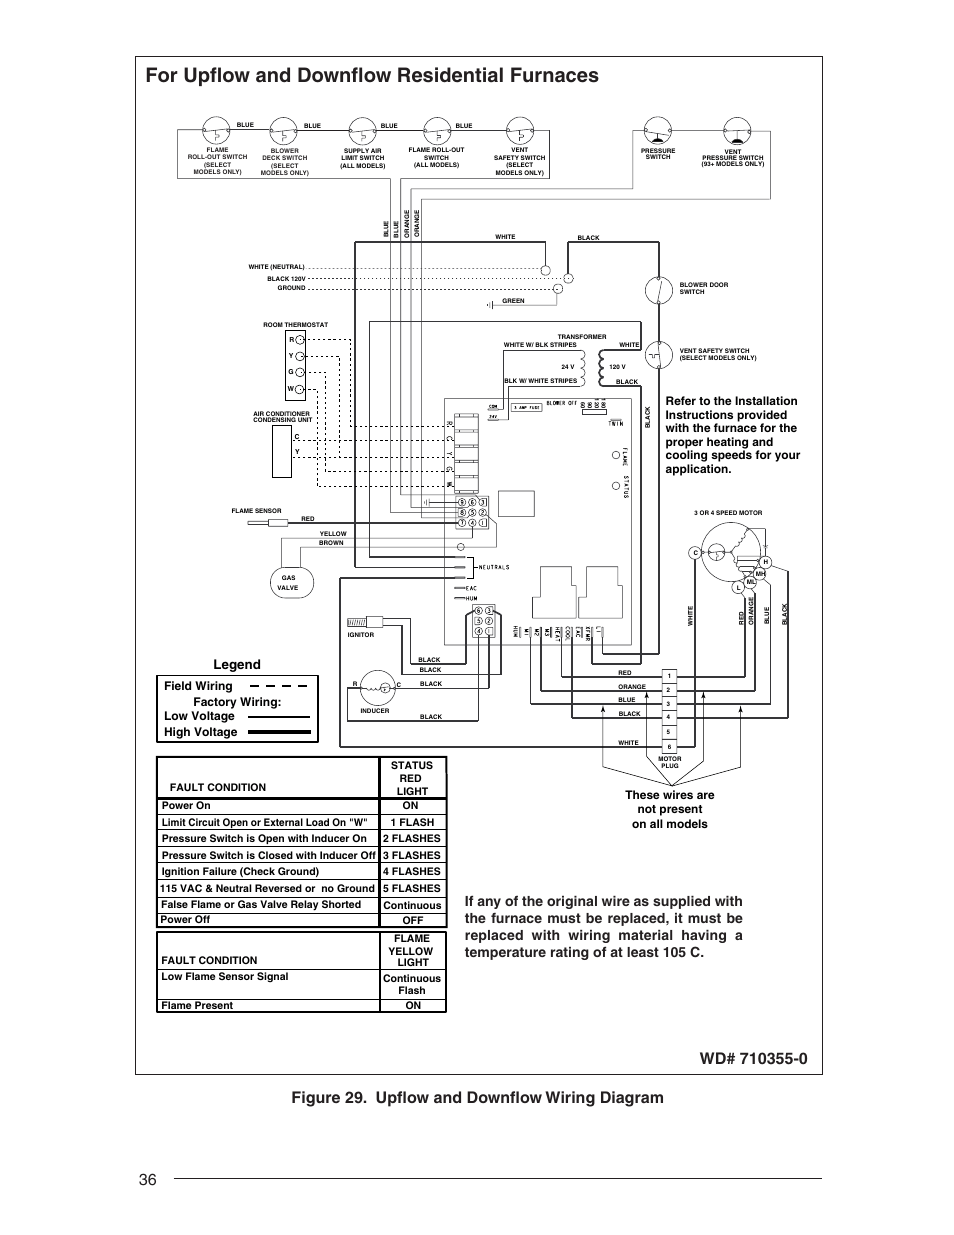 Nordyne Wiring Diagram For Gb5bv T36k B Schematic Diagrams Thermostat B3bmo24 House Symbols U2022